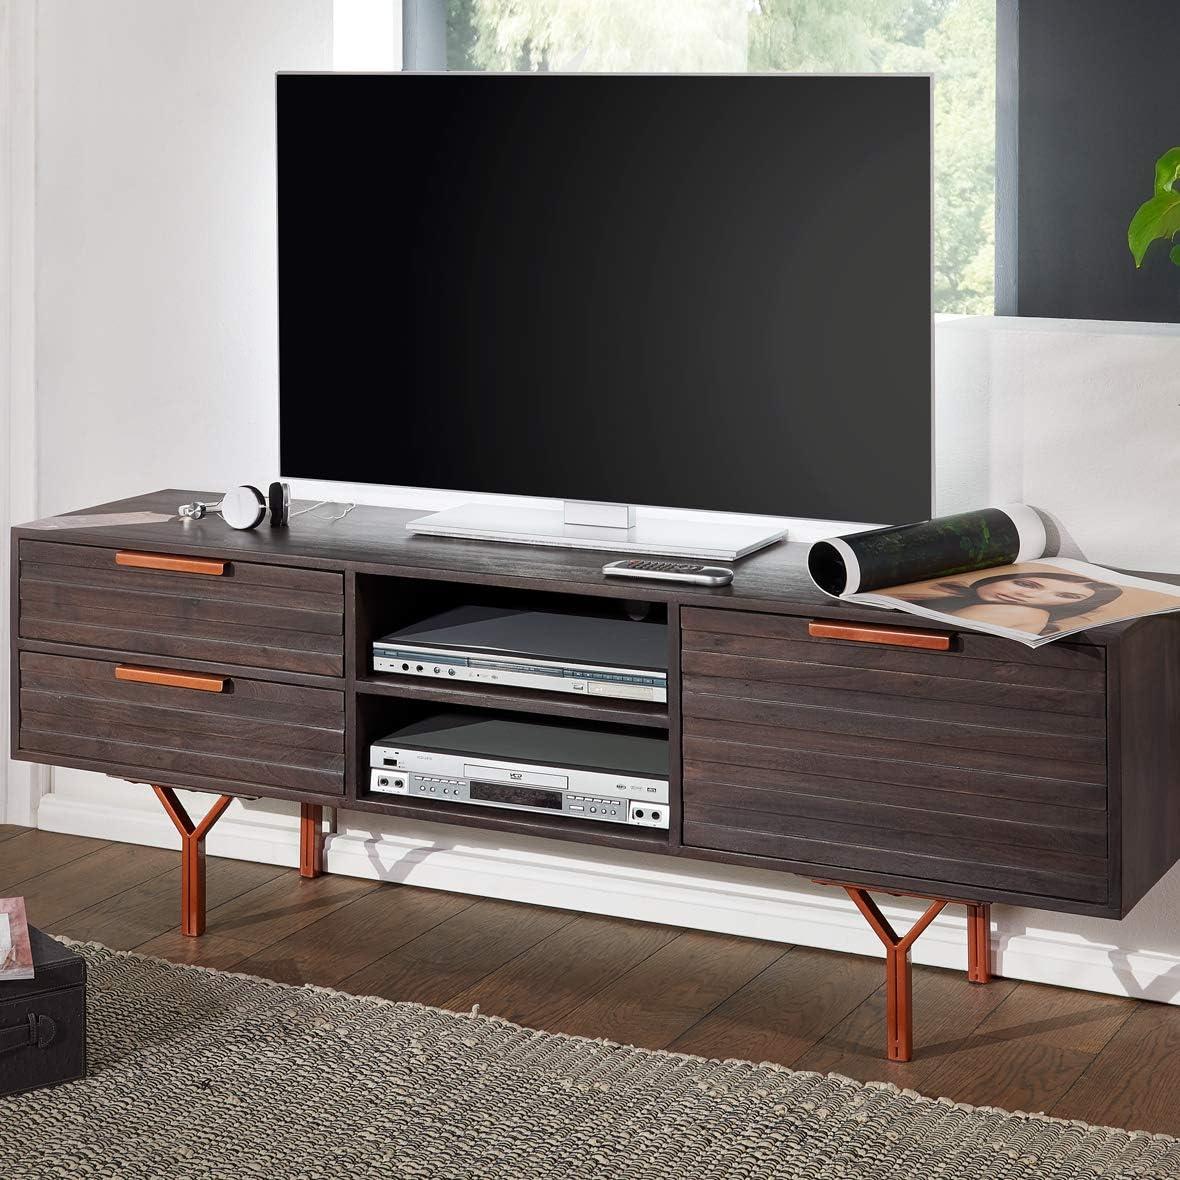 KadimaDesign - Mueble bajo para televisor de Madera Maciza de ...